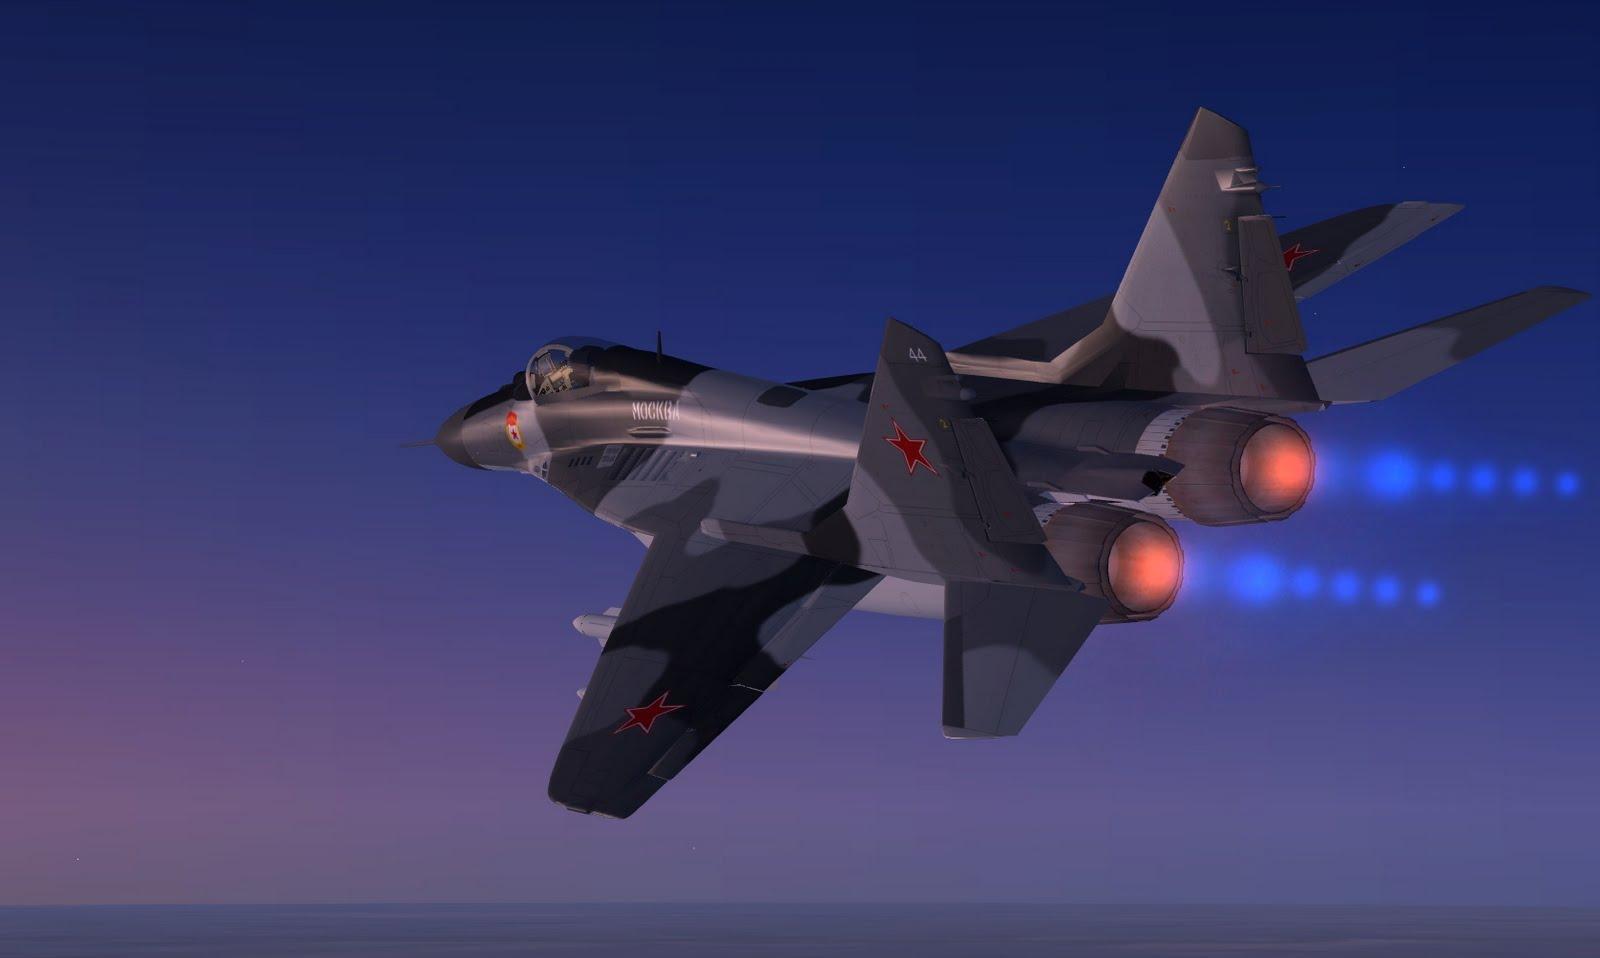 Mig 33 Fighter Gallery - 60.6KB